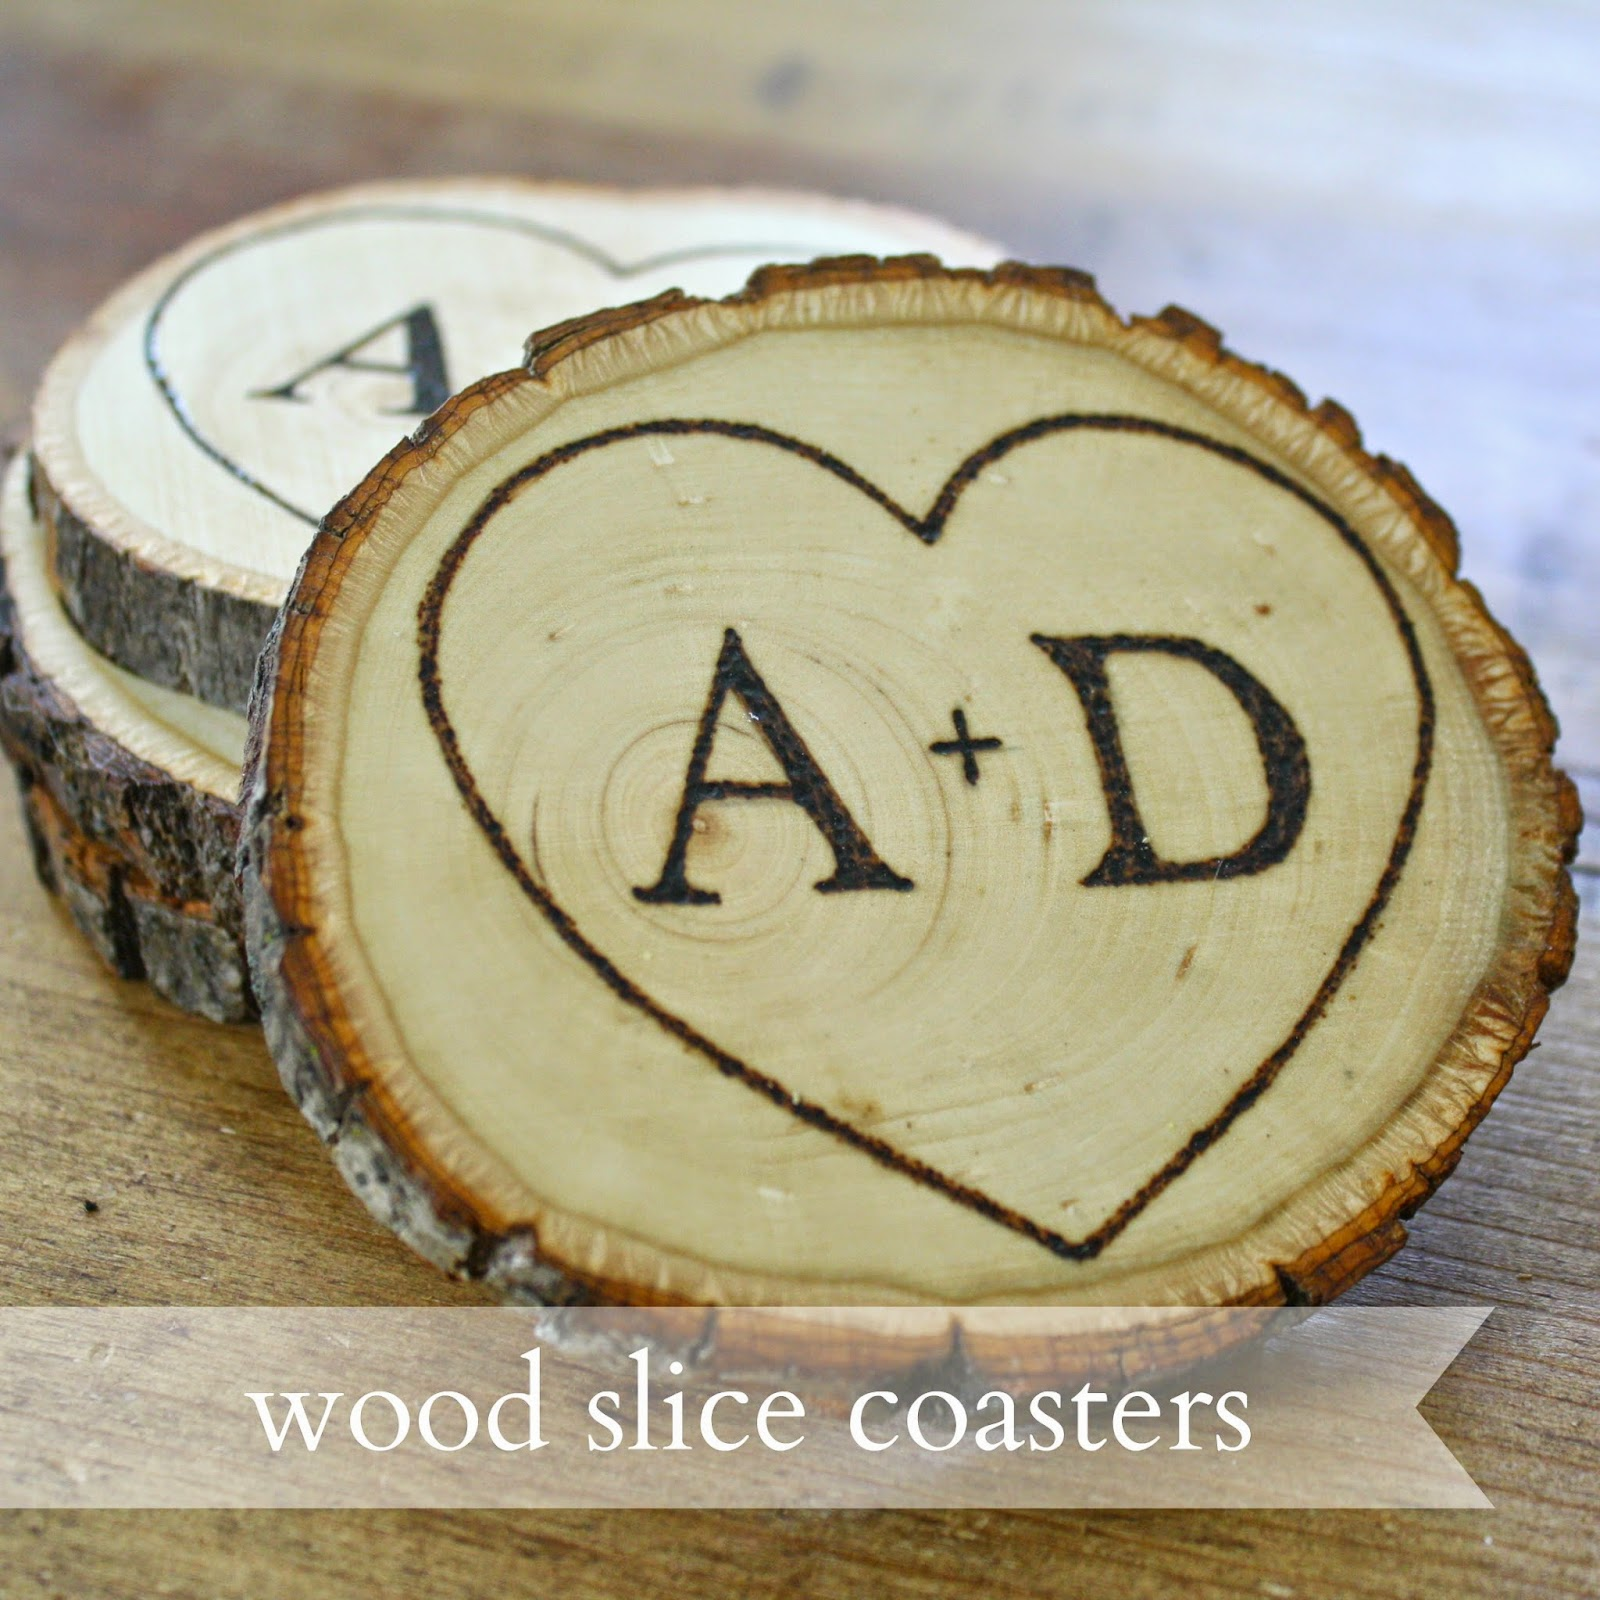 http://www.livealittlewilderblog.com/2015/04/wood-slice-coasters-diy-tutorial.html